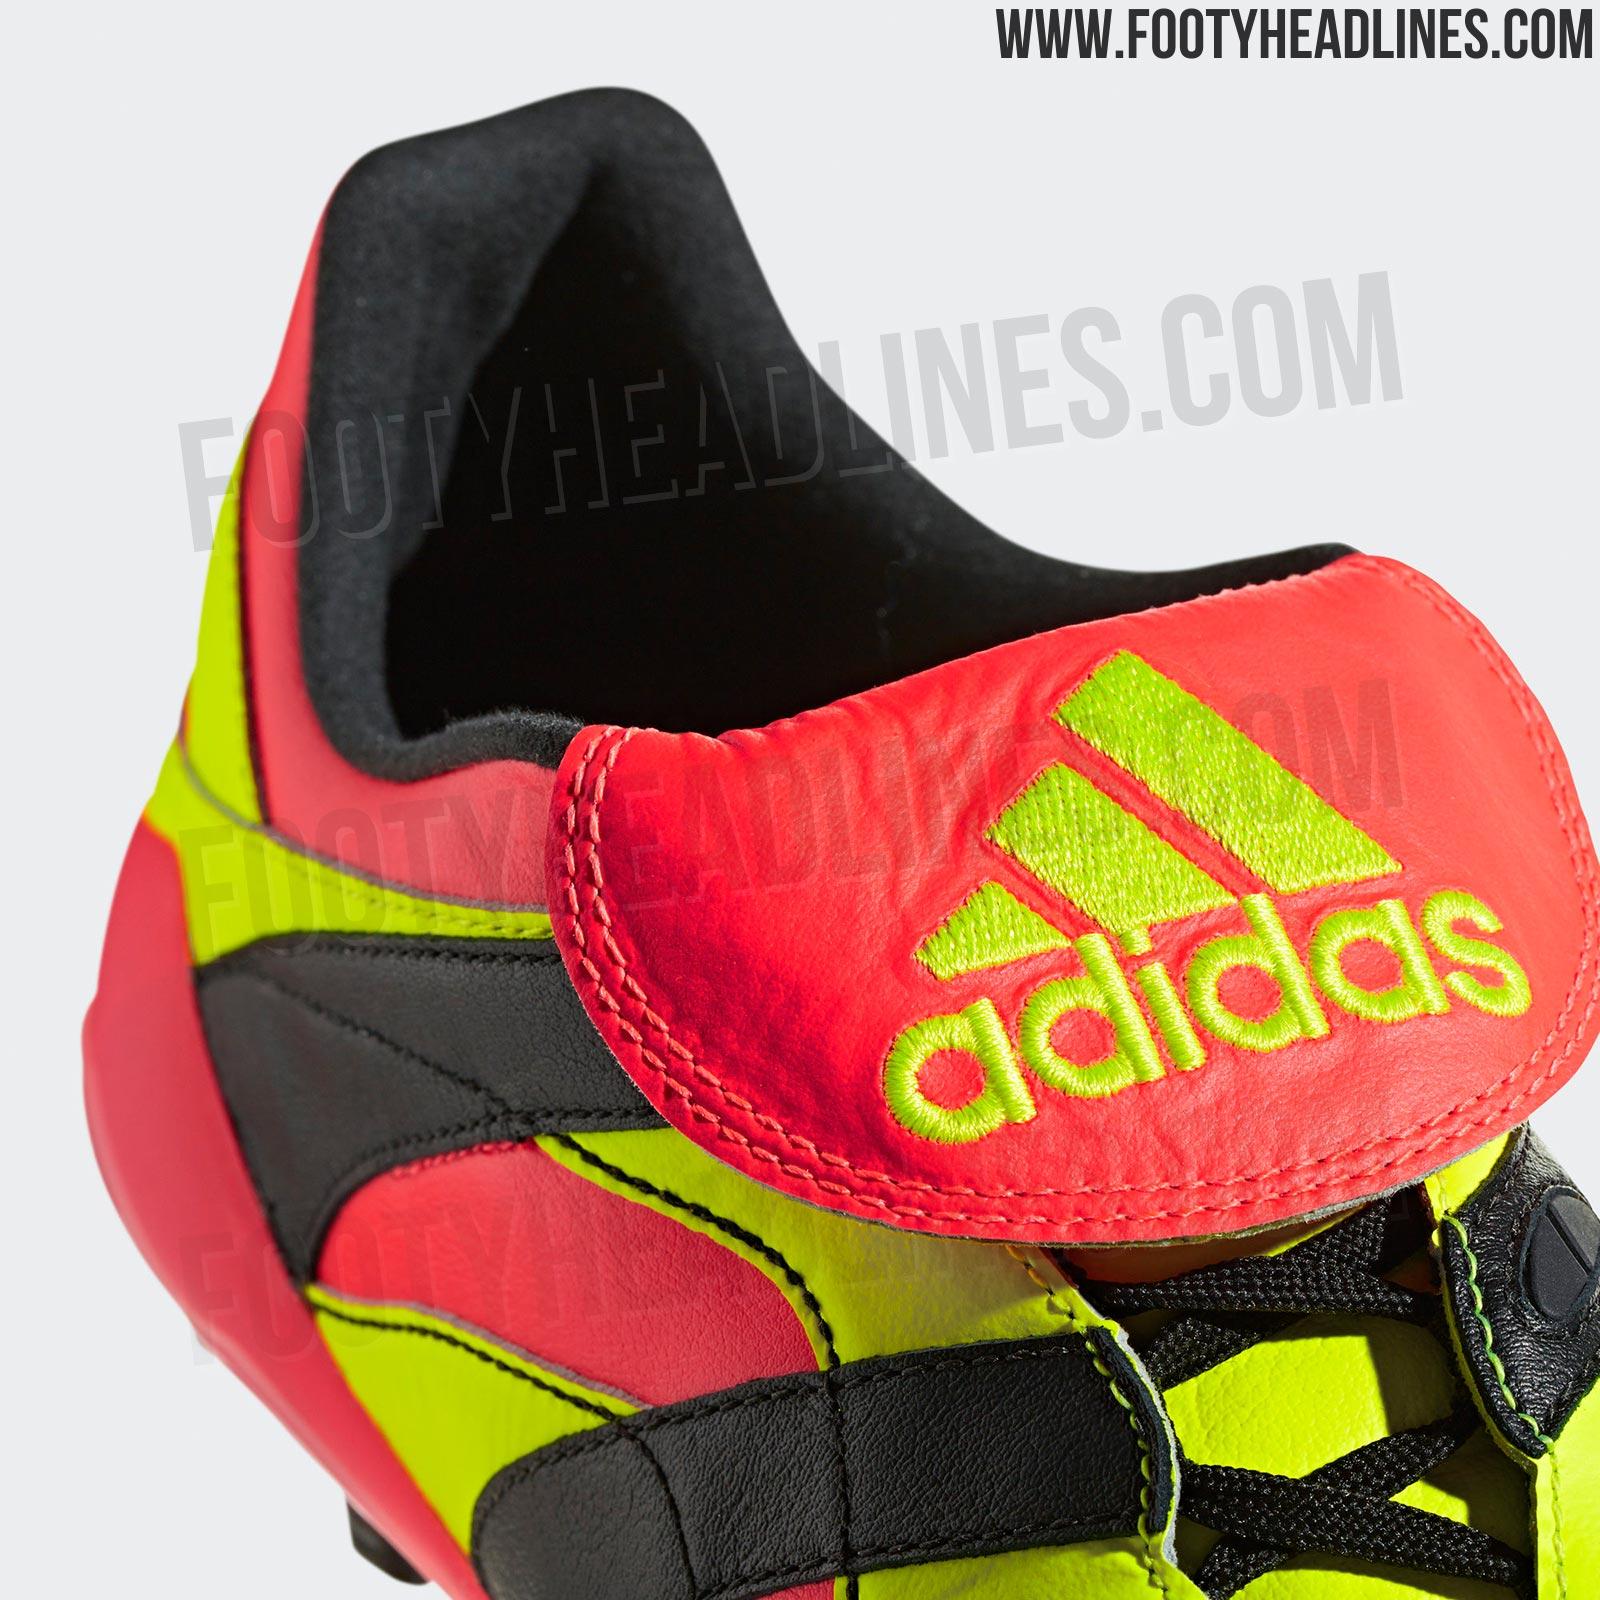 Adidas Sl Remake Shoes